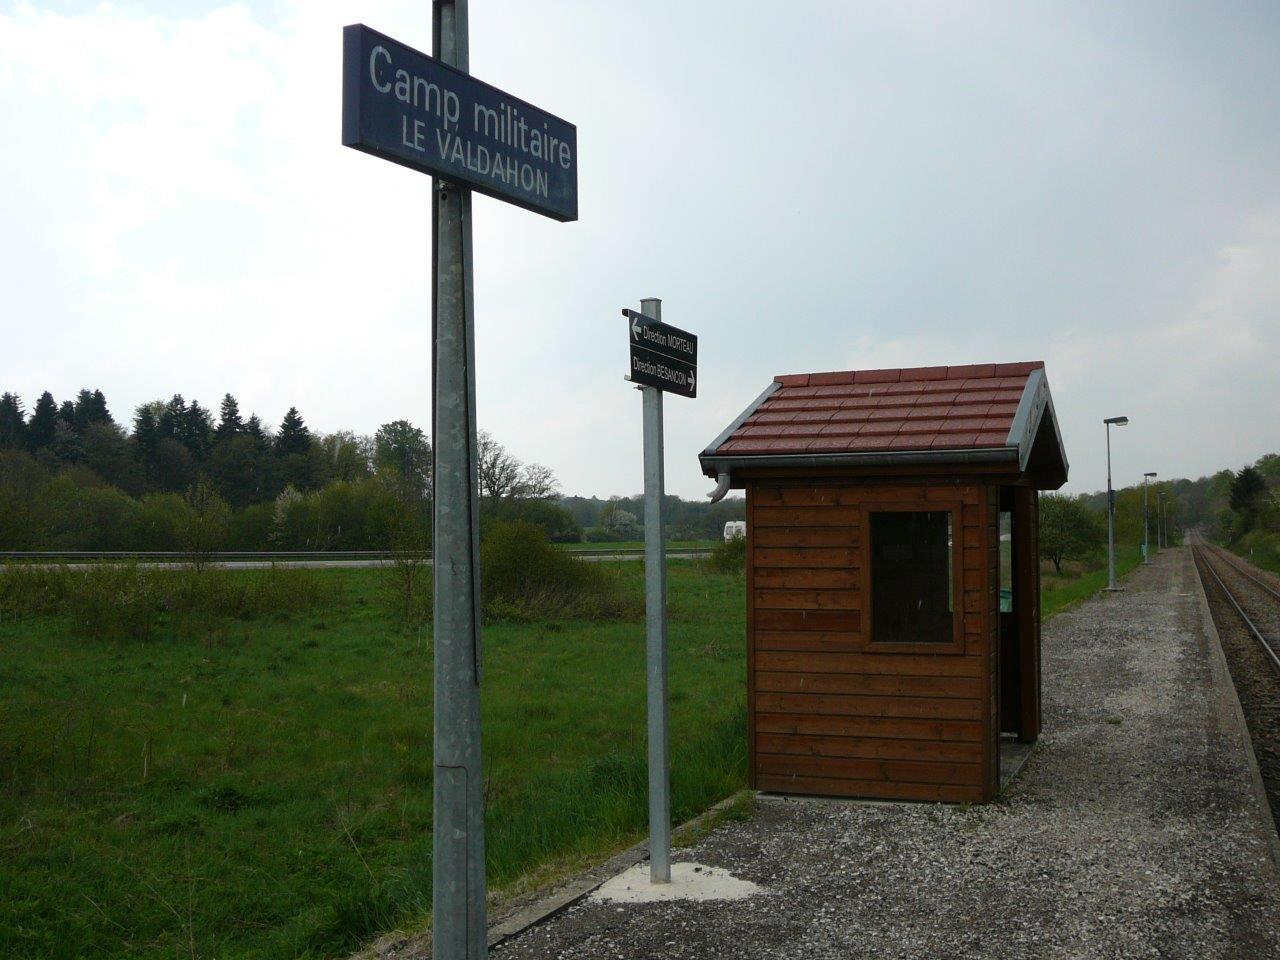 gare-du-valdahon-camp-militaire-train-station